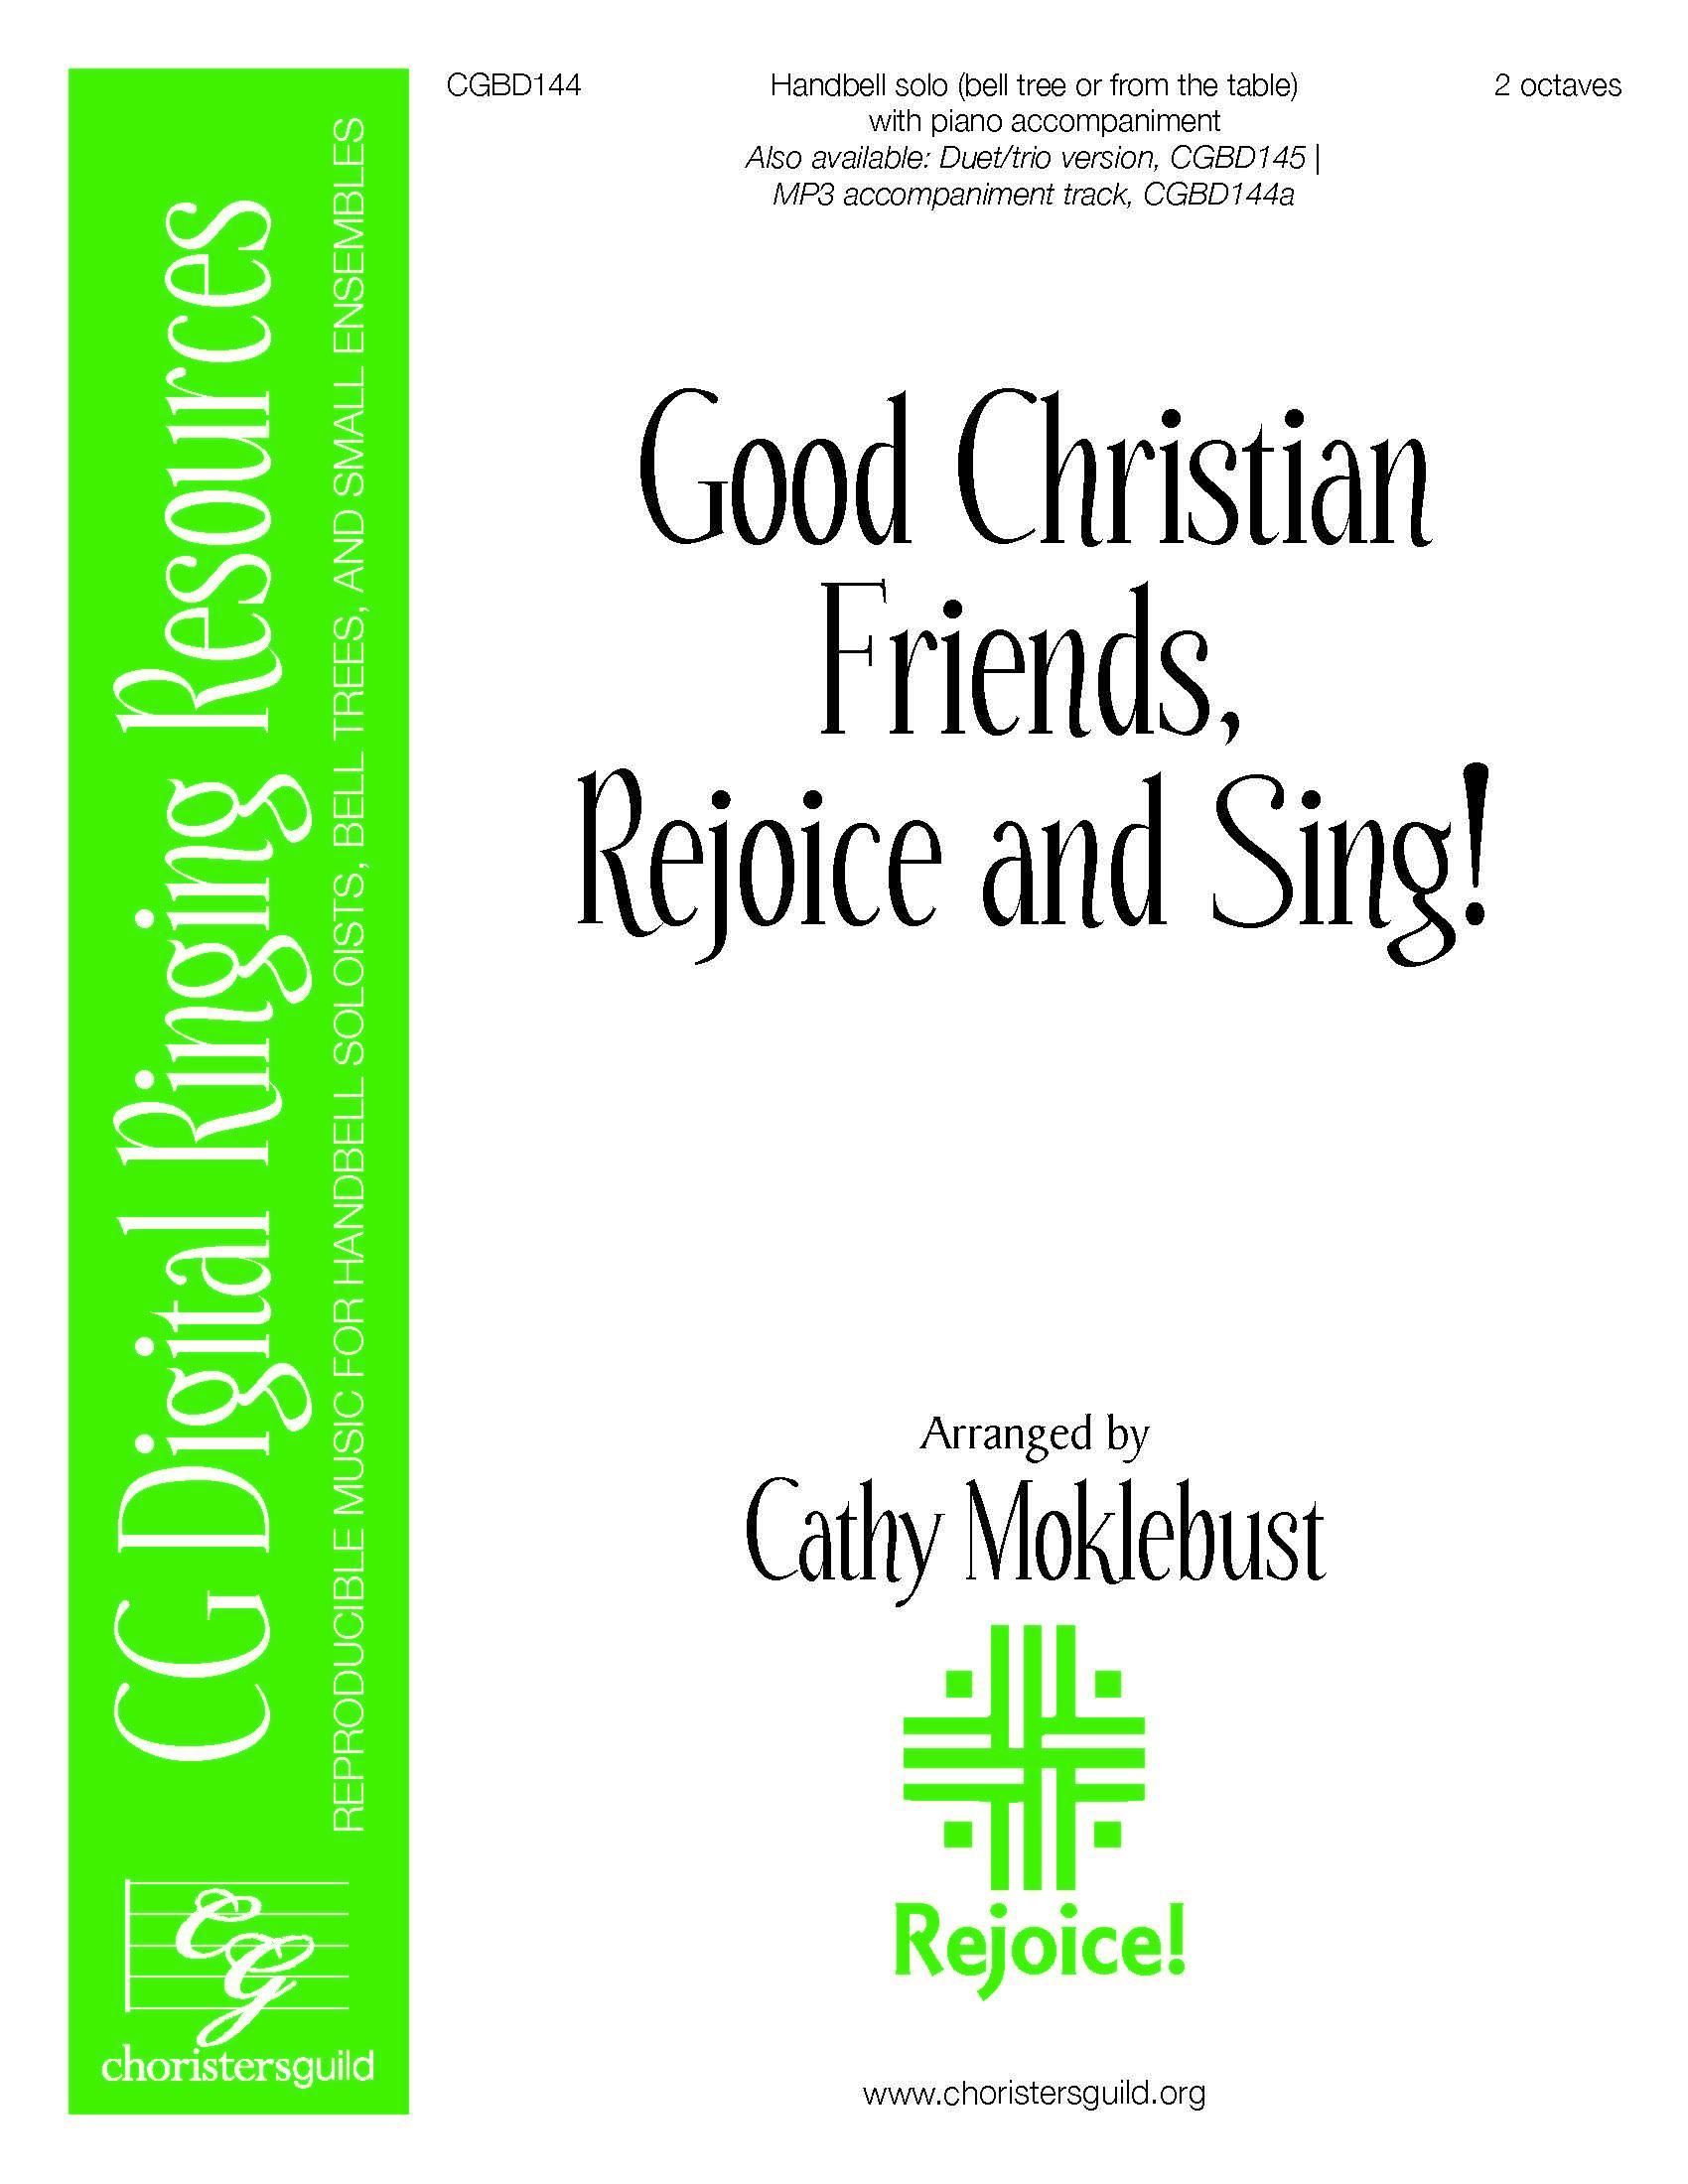 Good Christian Friends Rejoice, and Sing! - Digital Accompaniment Track